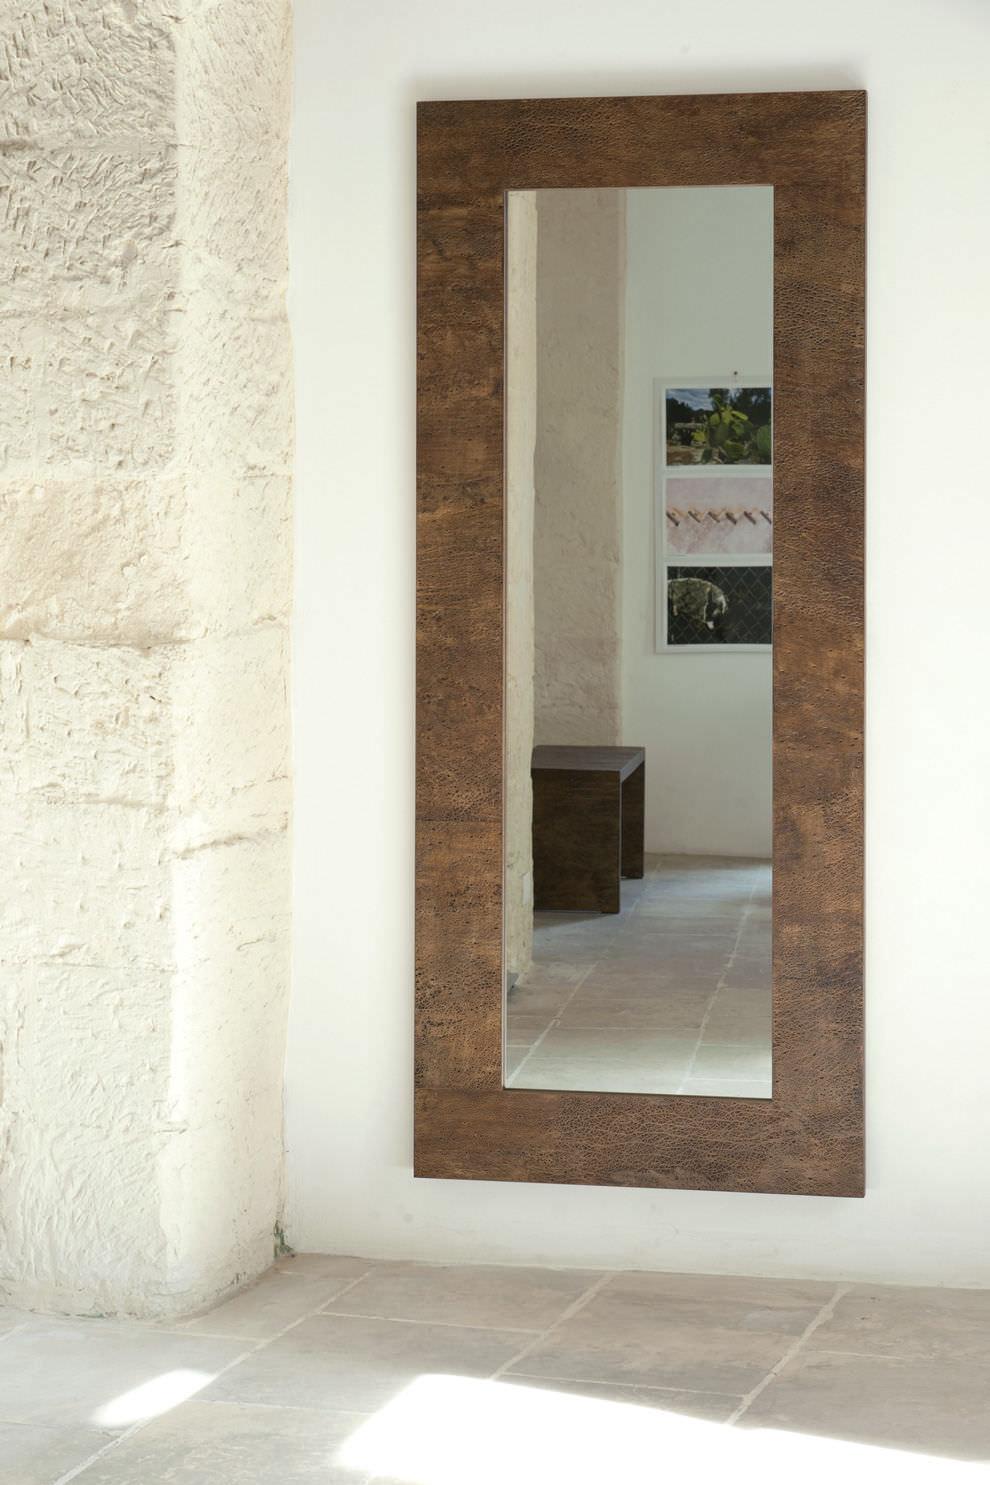 Miroir mural contemporain rectangulaire en bois 180